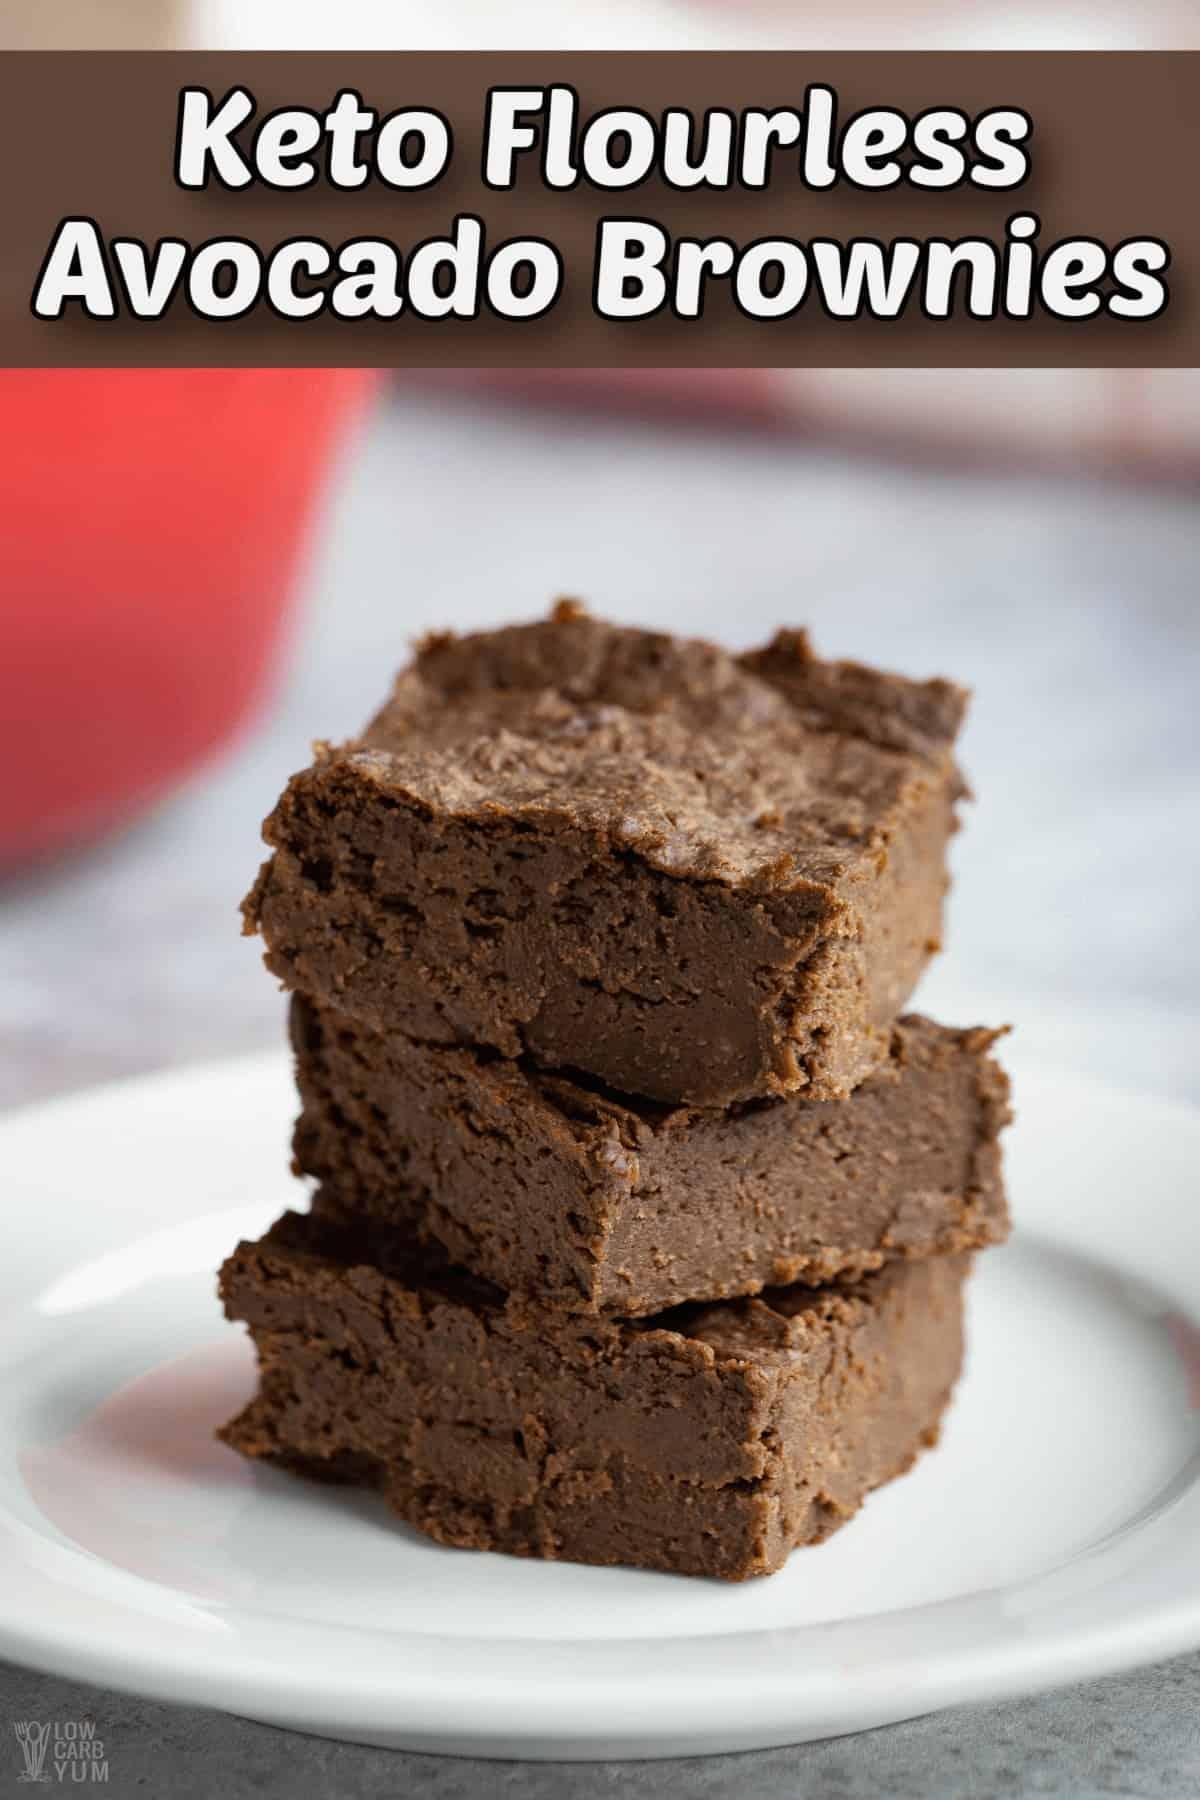 flourless low carb keto avocado brownies pintrest image